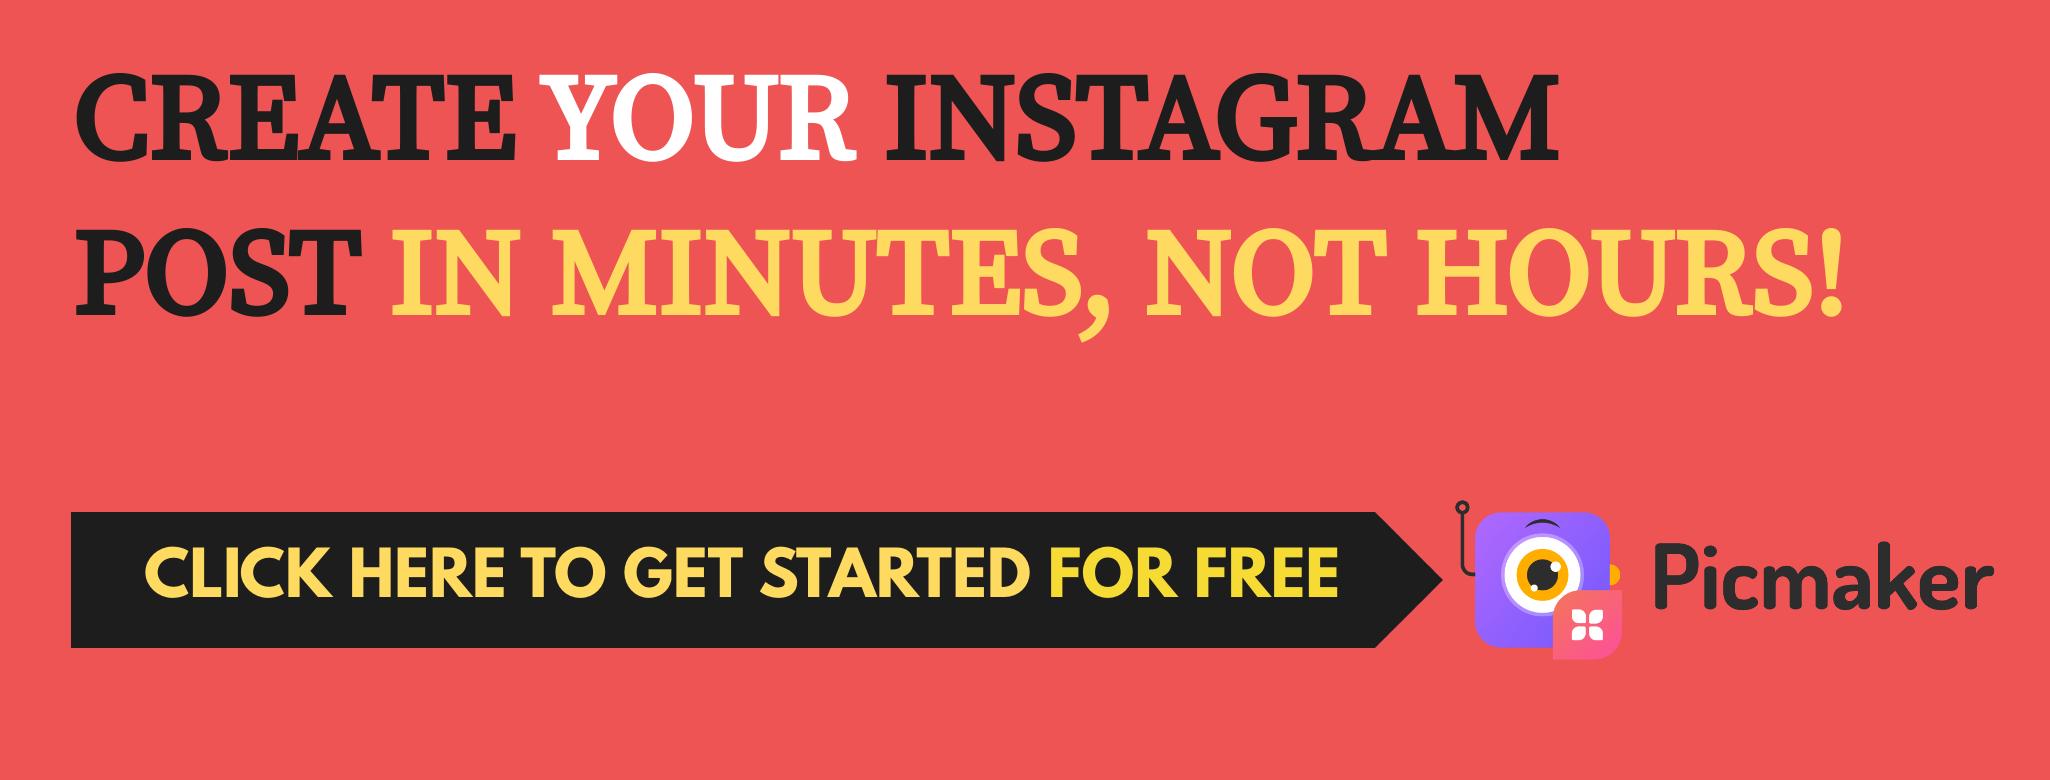 Design Instagram posts banner Picmaker